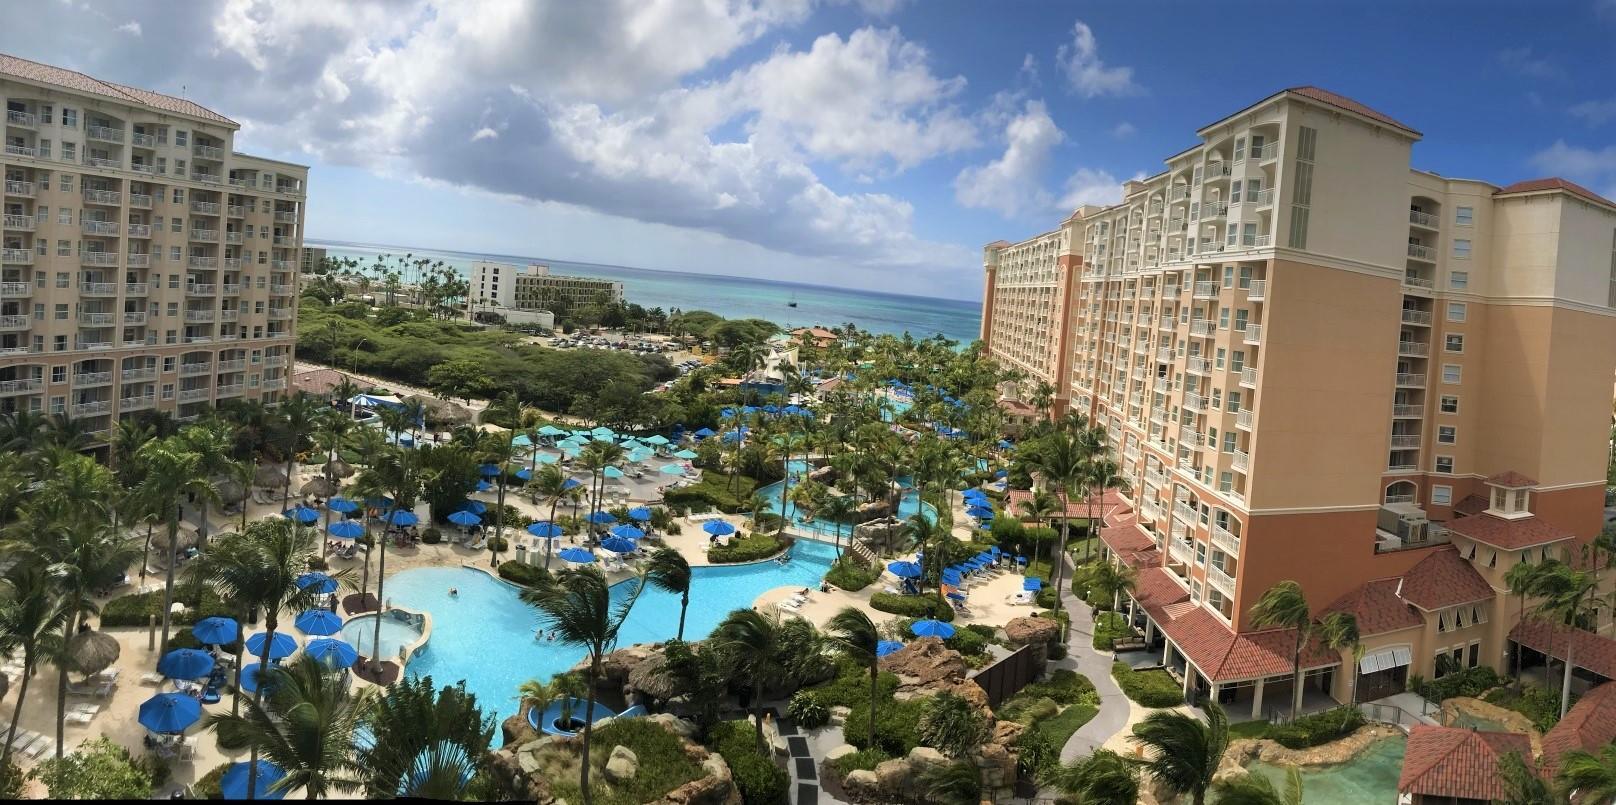 1. Marriott Aruba Surf Club